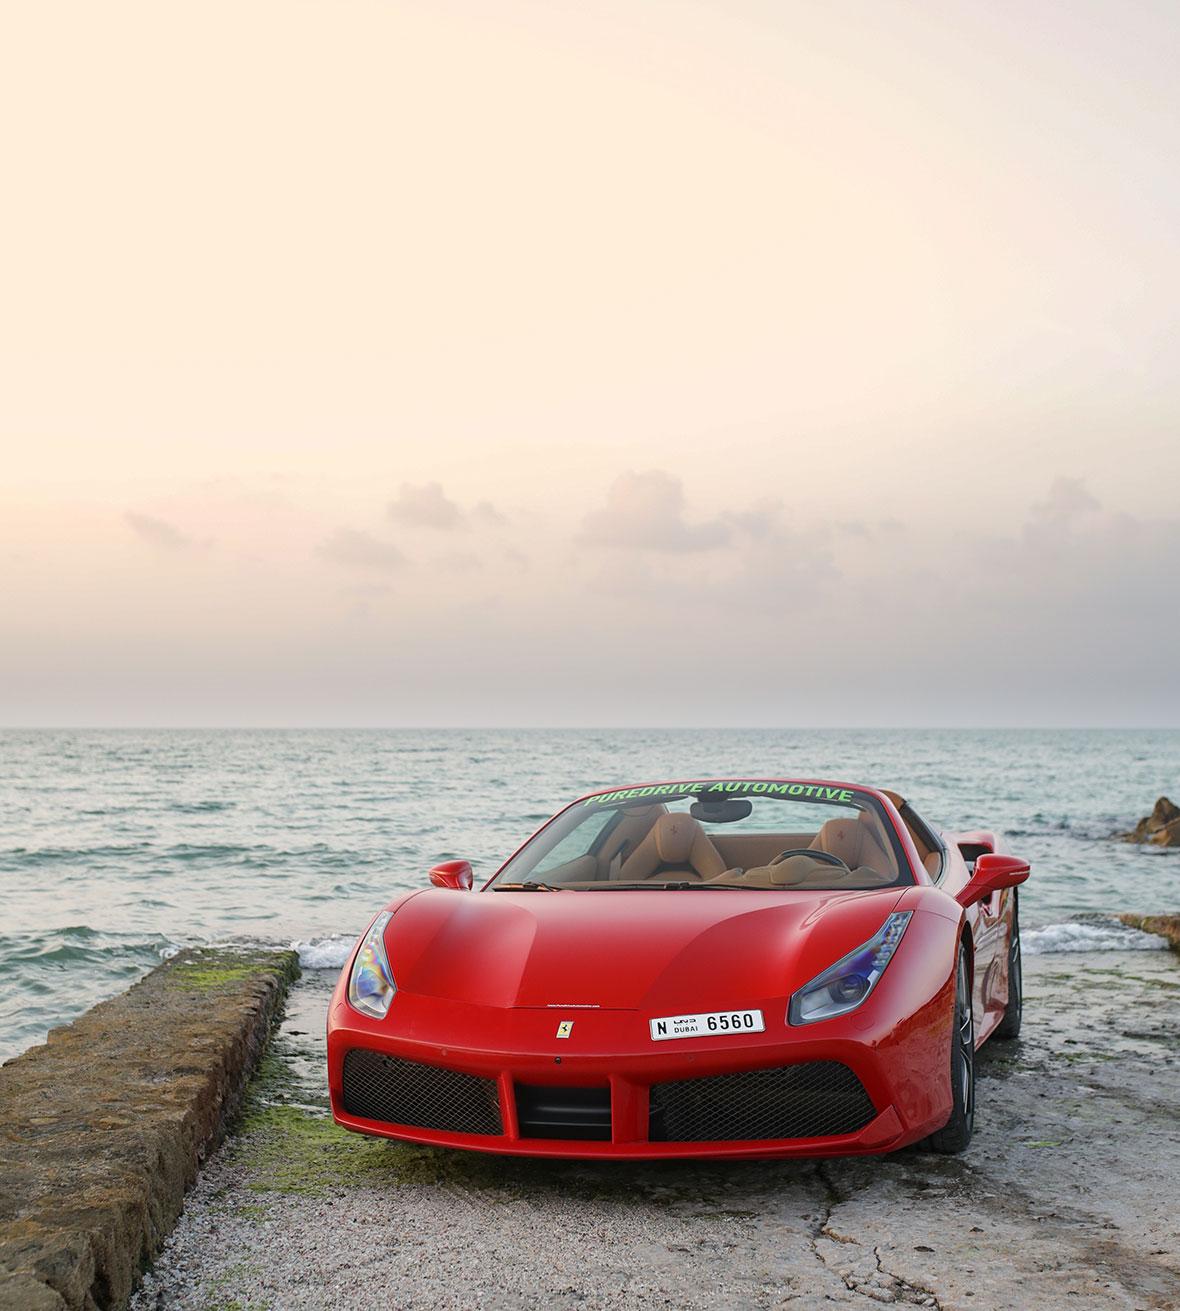 Supercar Dubai: Asia's Premier Destination For Motoring